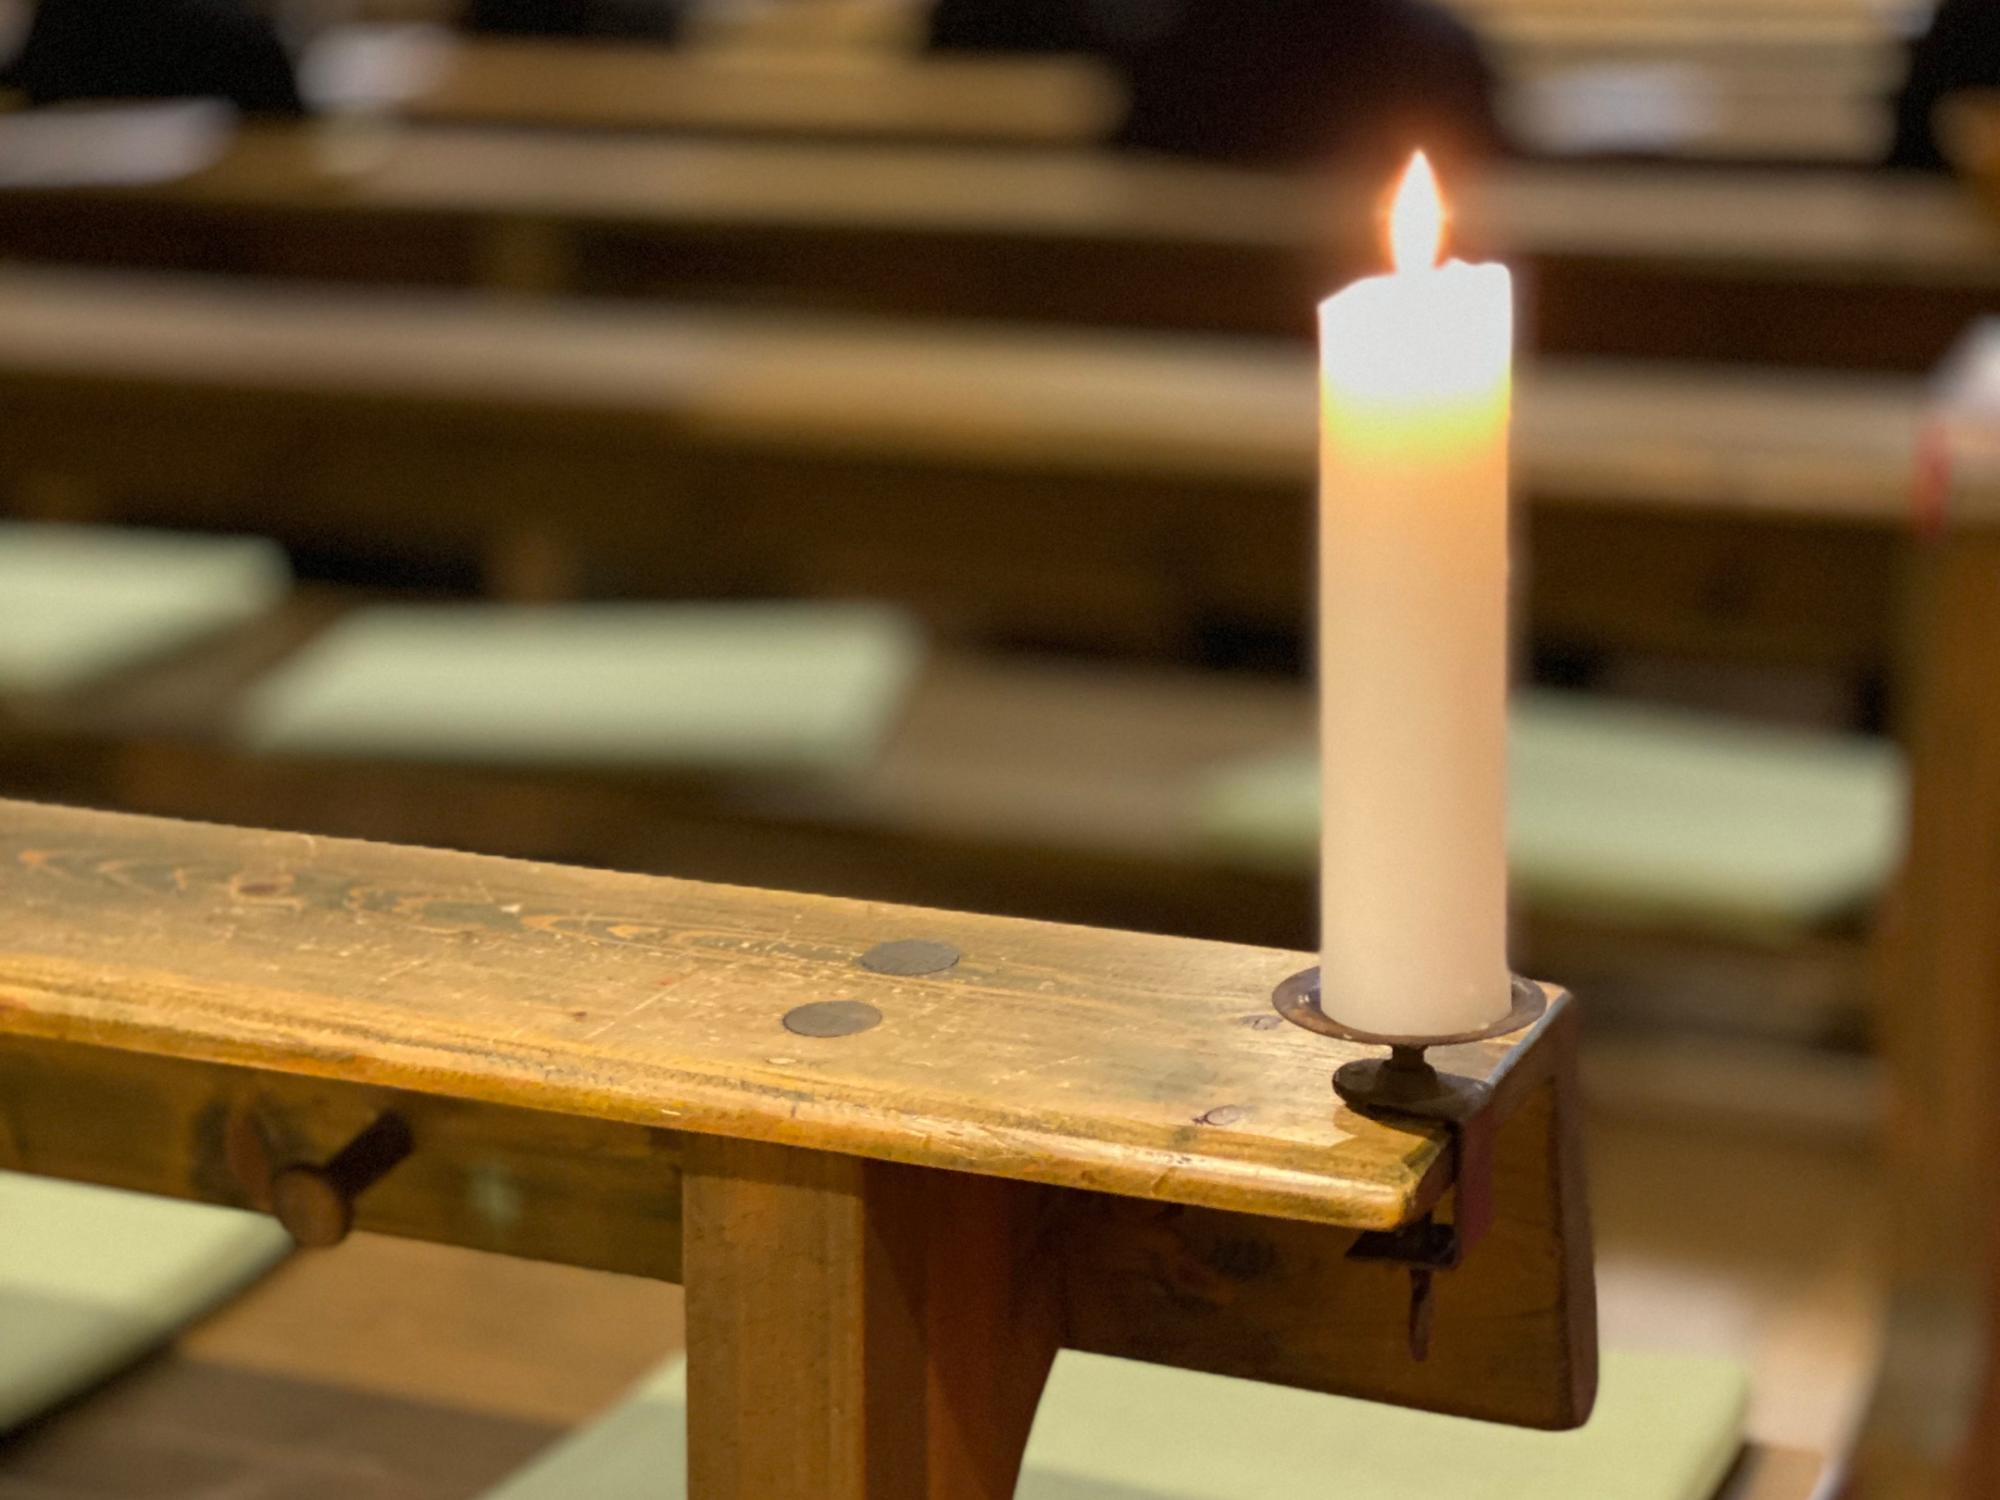 Kerze auf Kirchenbank (c) Bild: Martin Battert In: Pfarrbriefservice.de